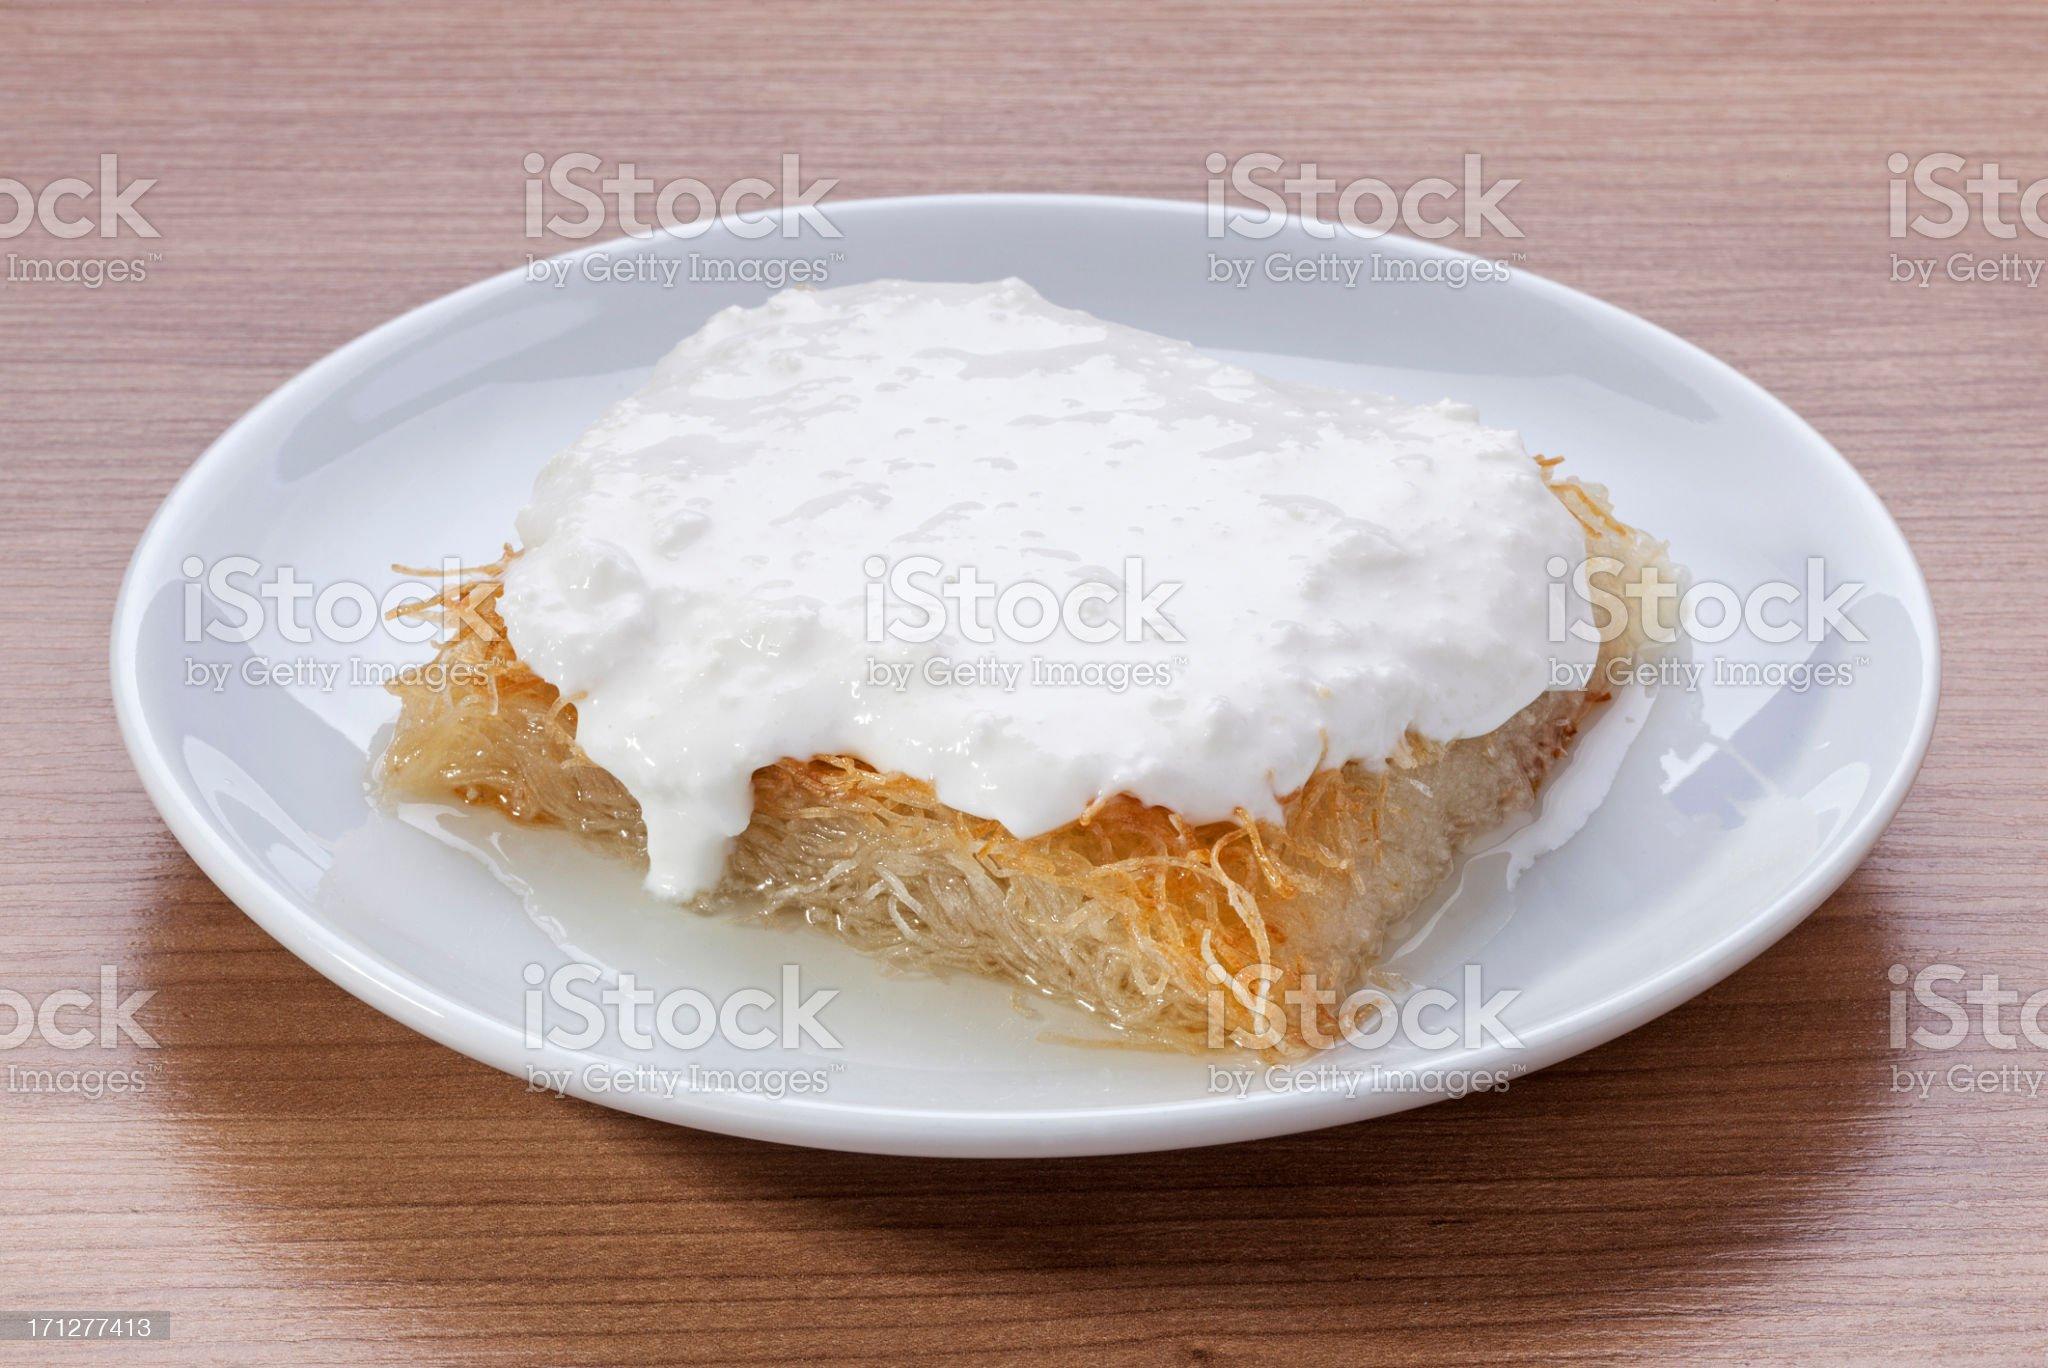 Kadayif (Turkish dessert) royalty-free stock photo